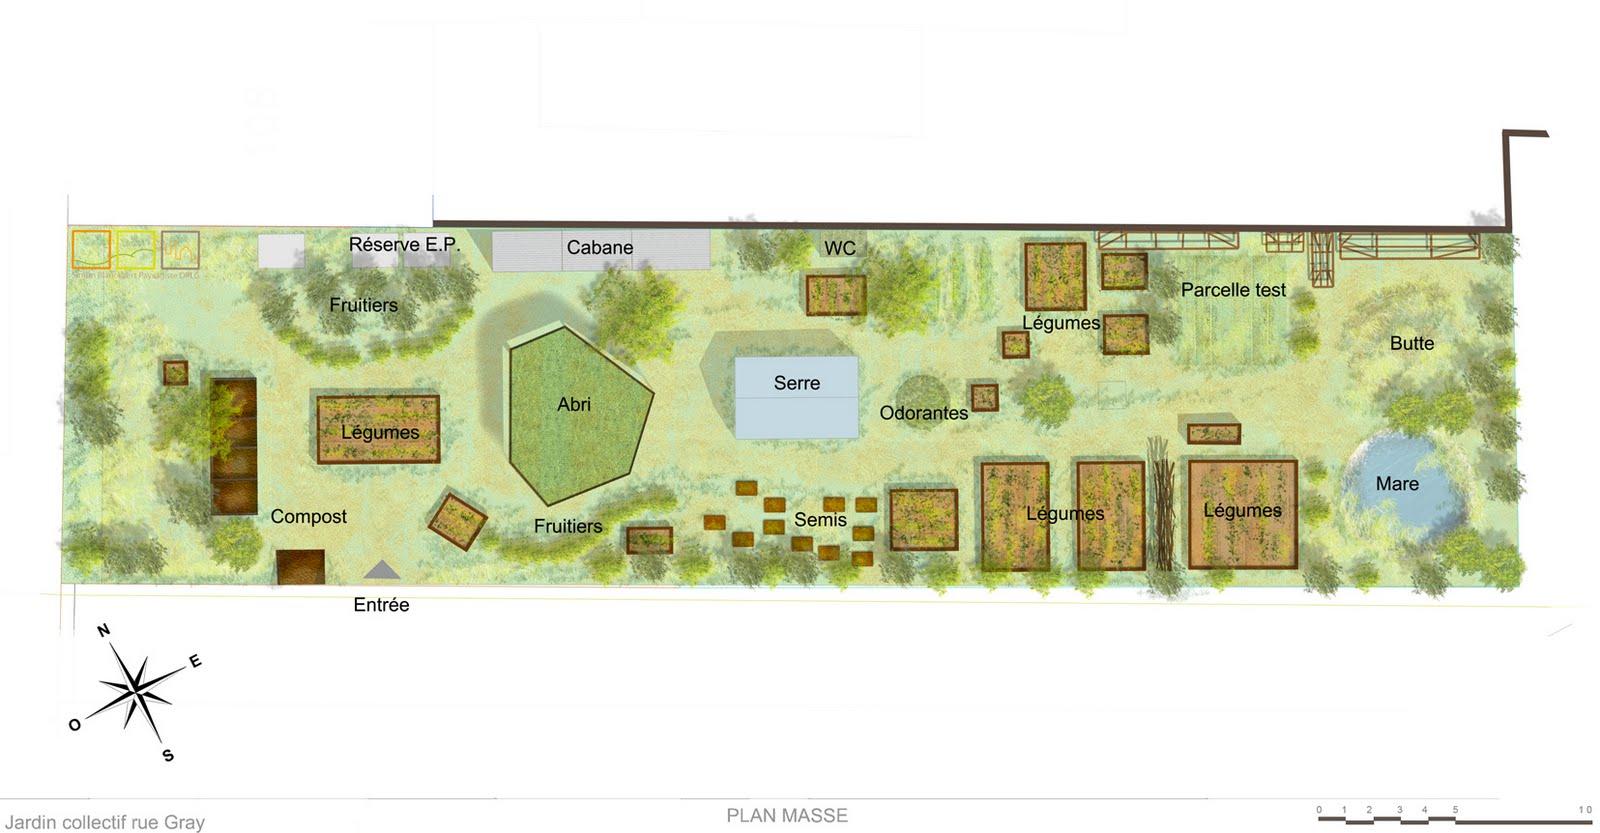 Jardin collectif de la rue gray projet de plan du jardin for Projet de plan